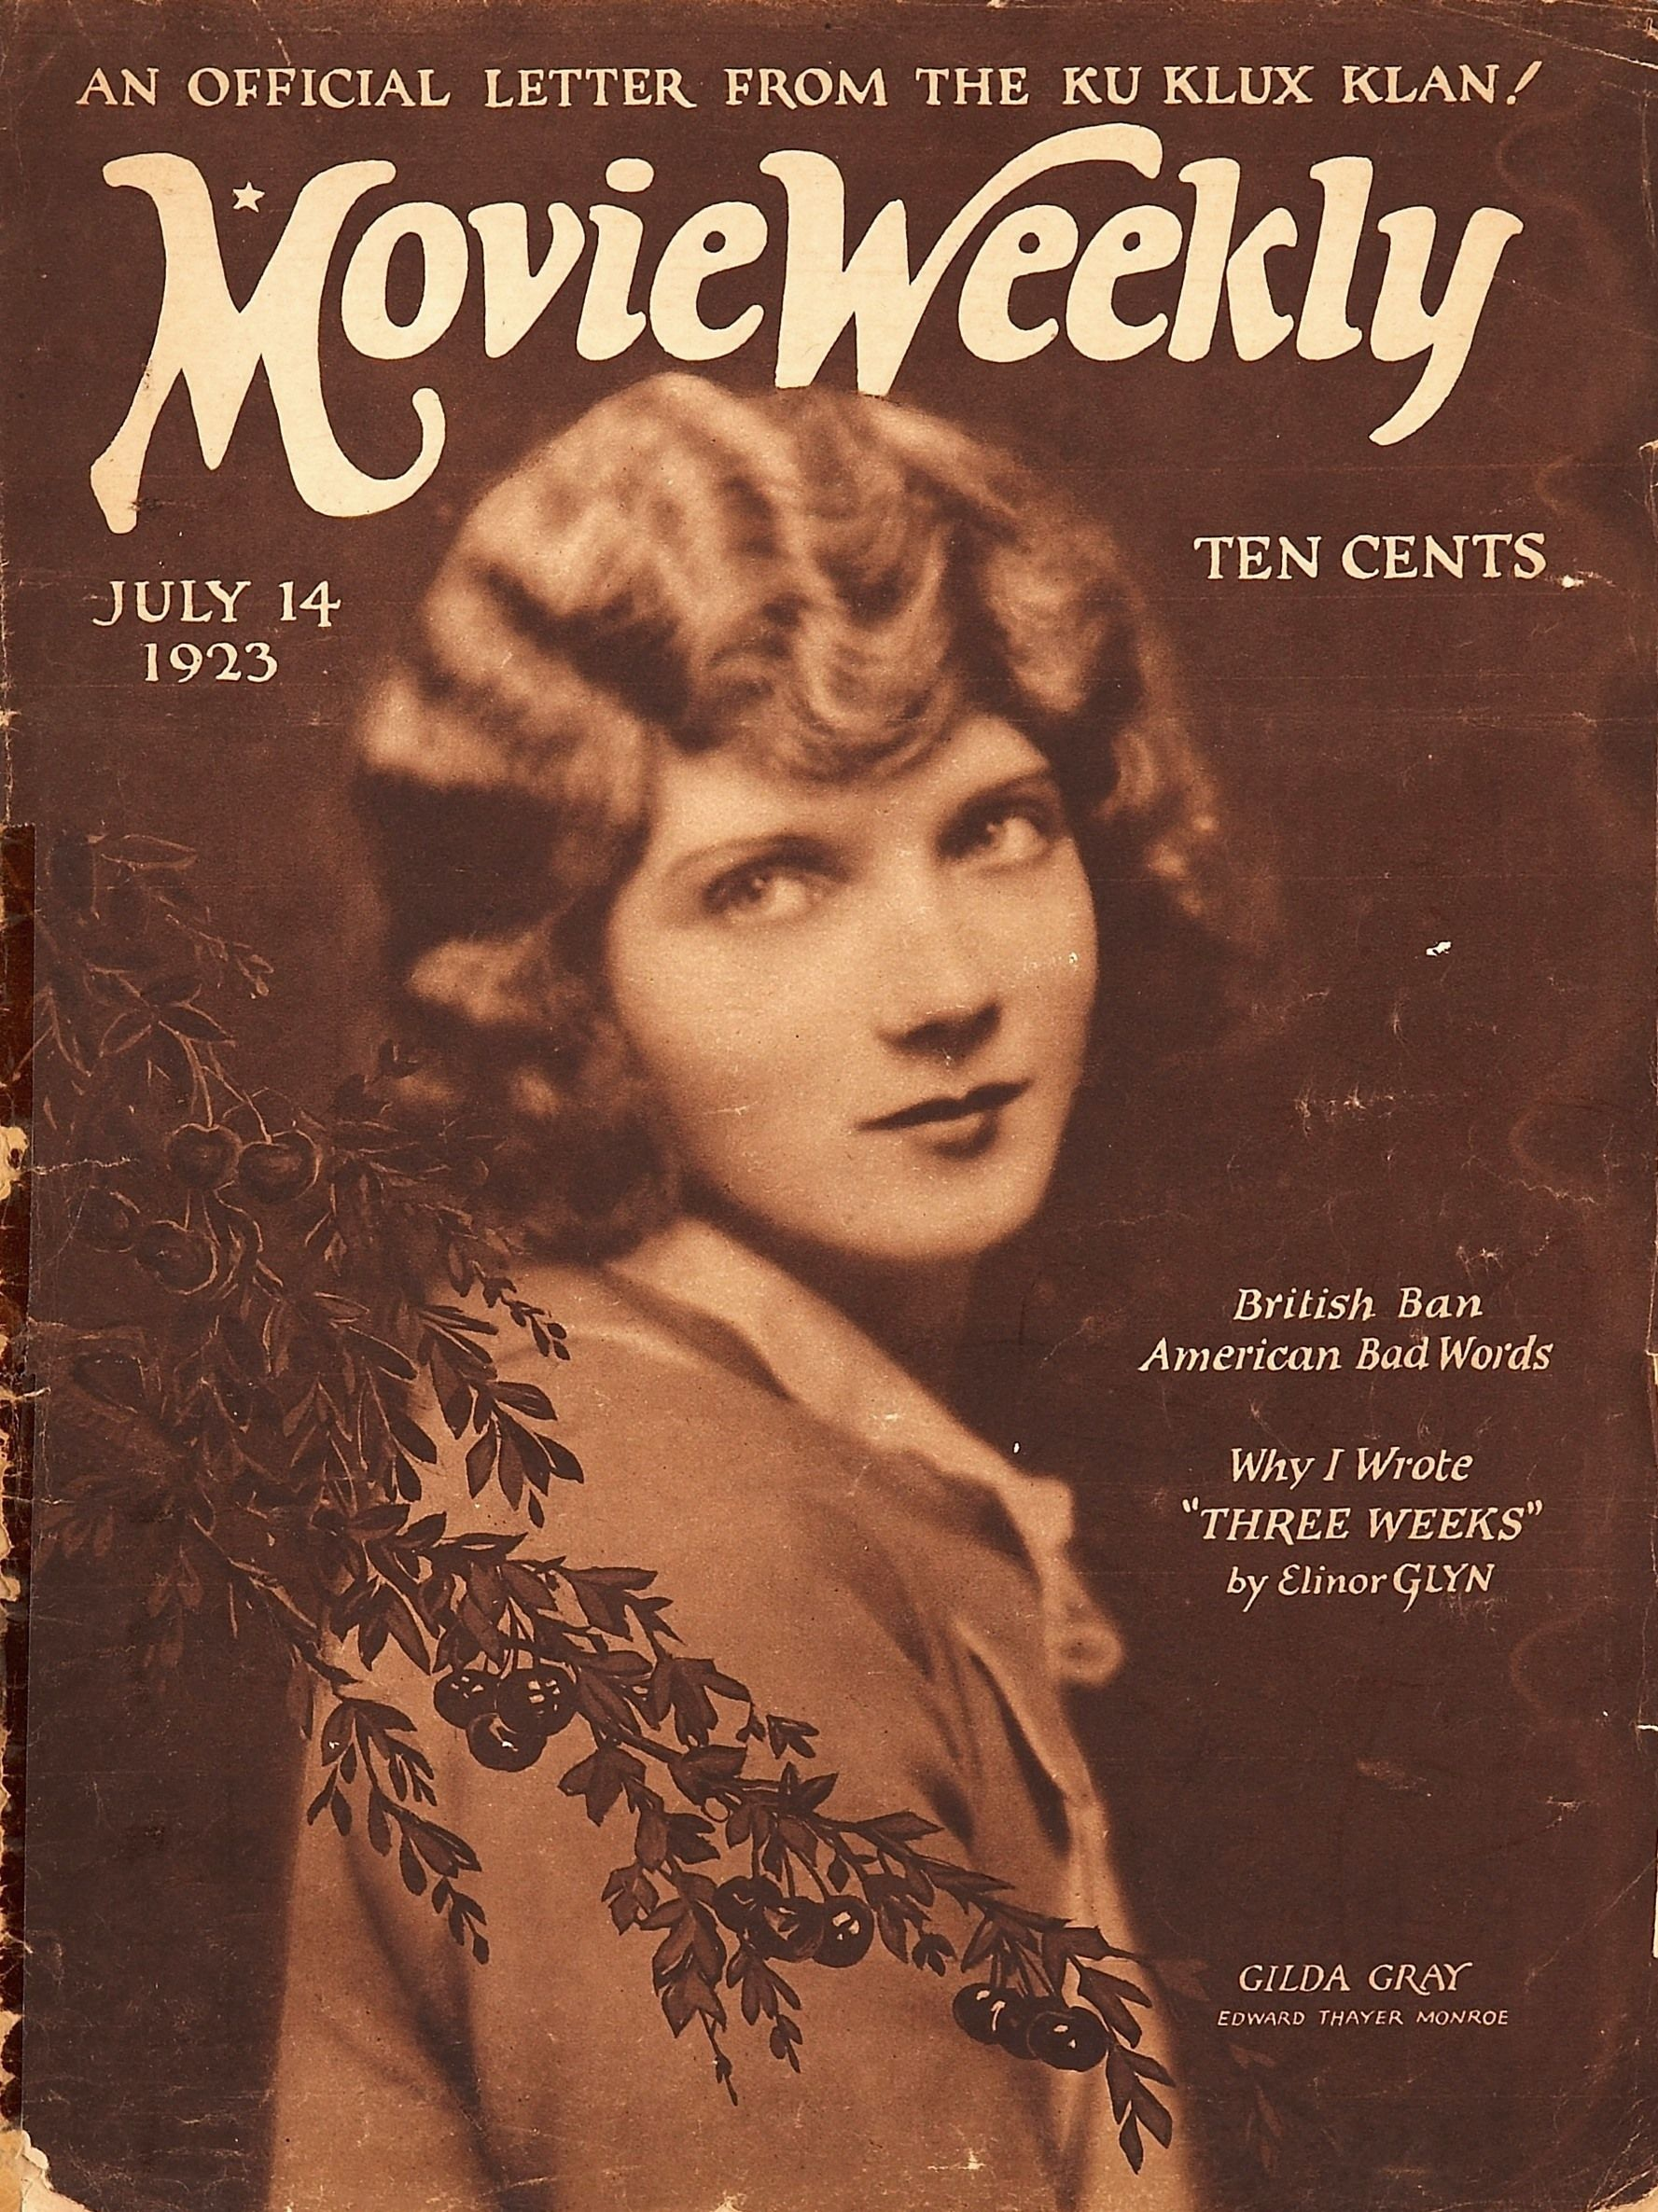 Movie Weekly - 1923 - Portada de Edward Thayer Monroe